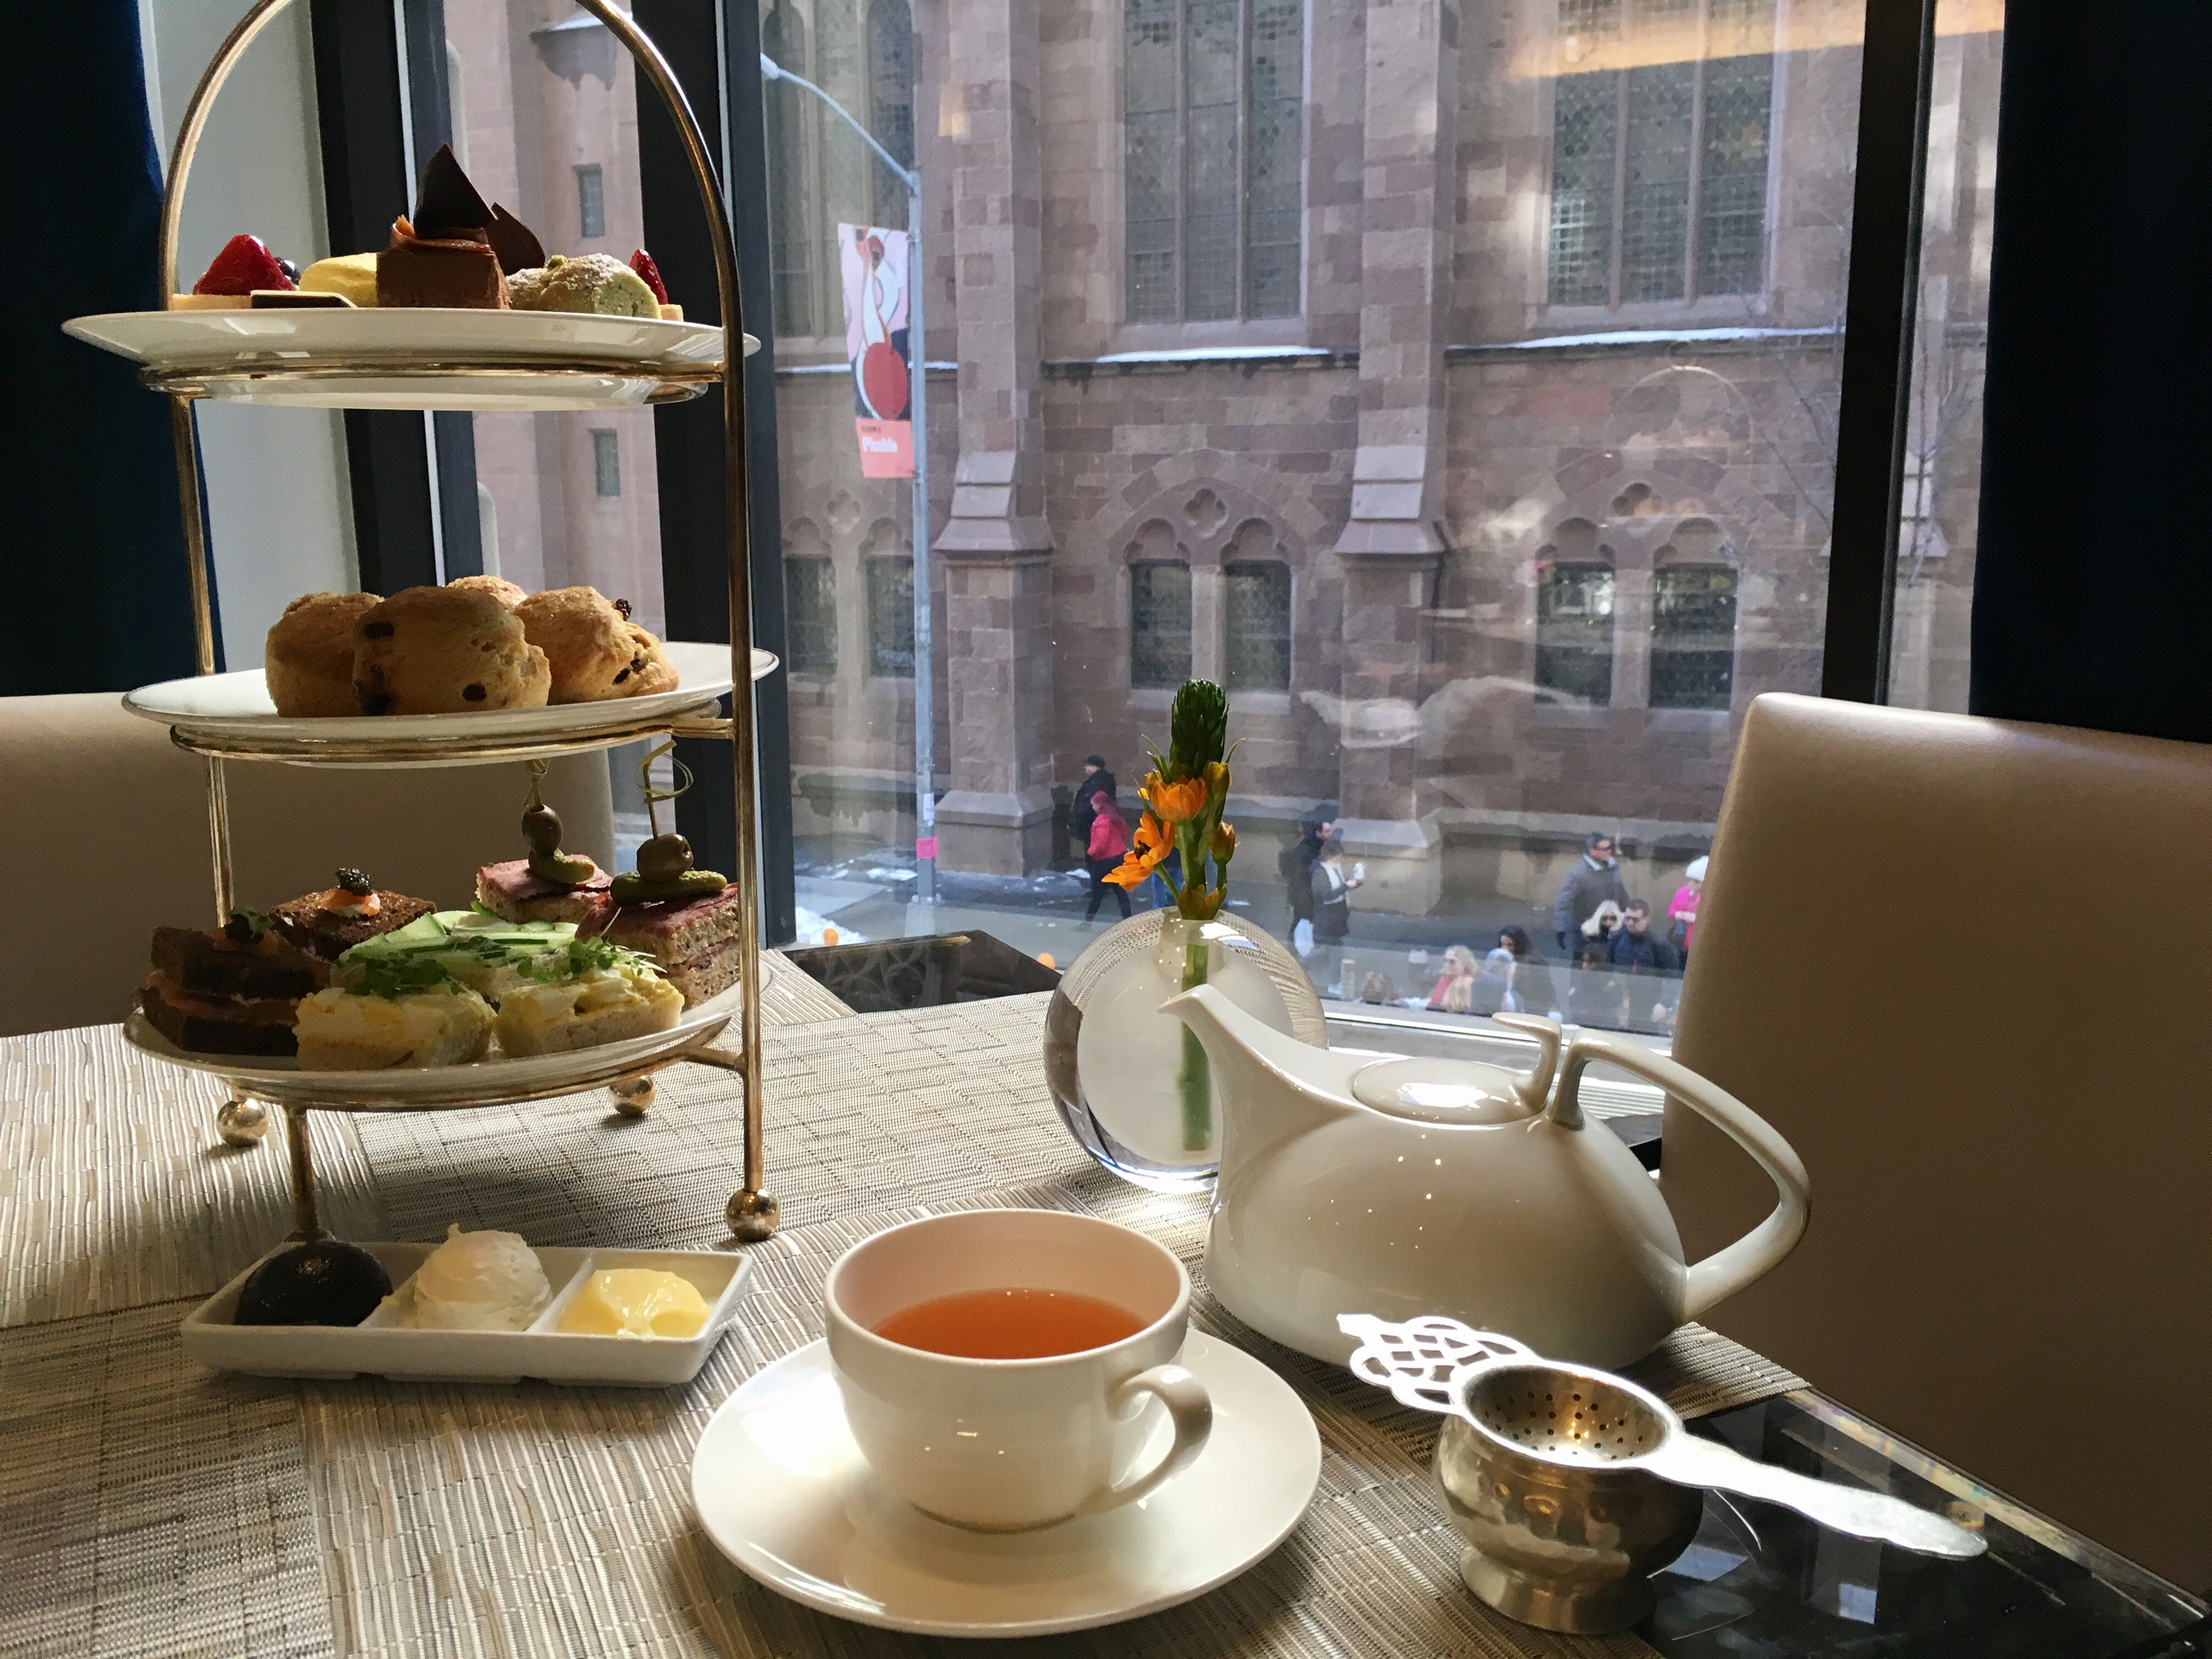 Peninsula Hotel New York Afternoon Tea